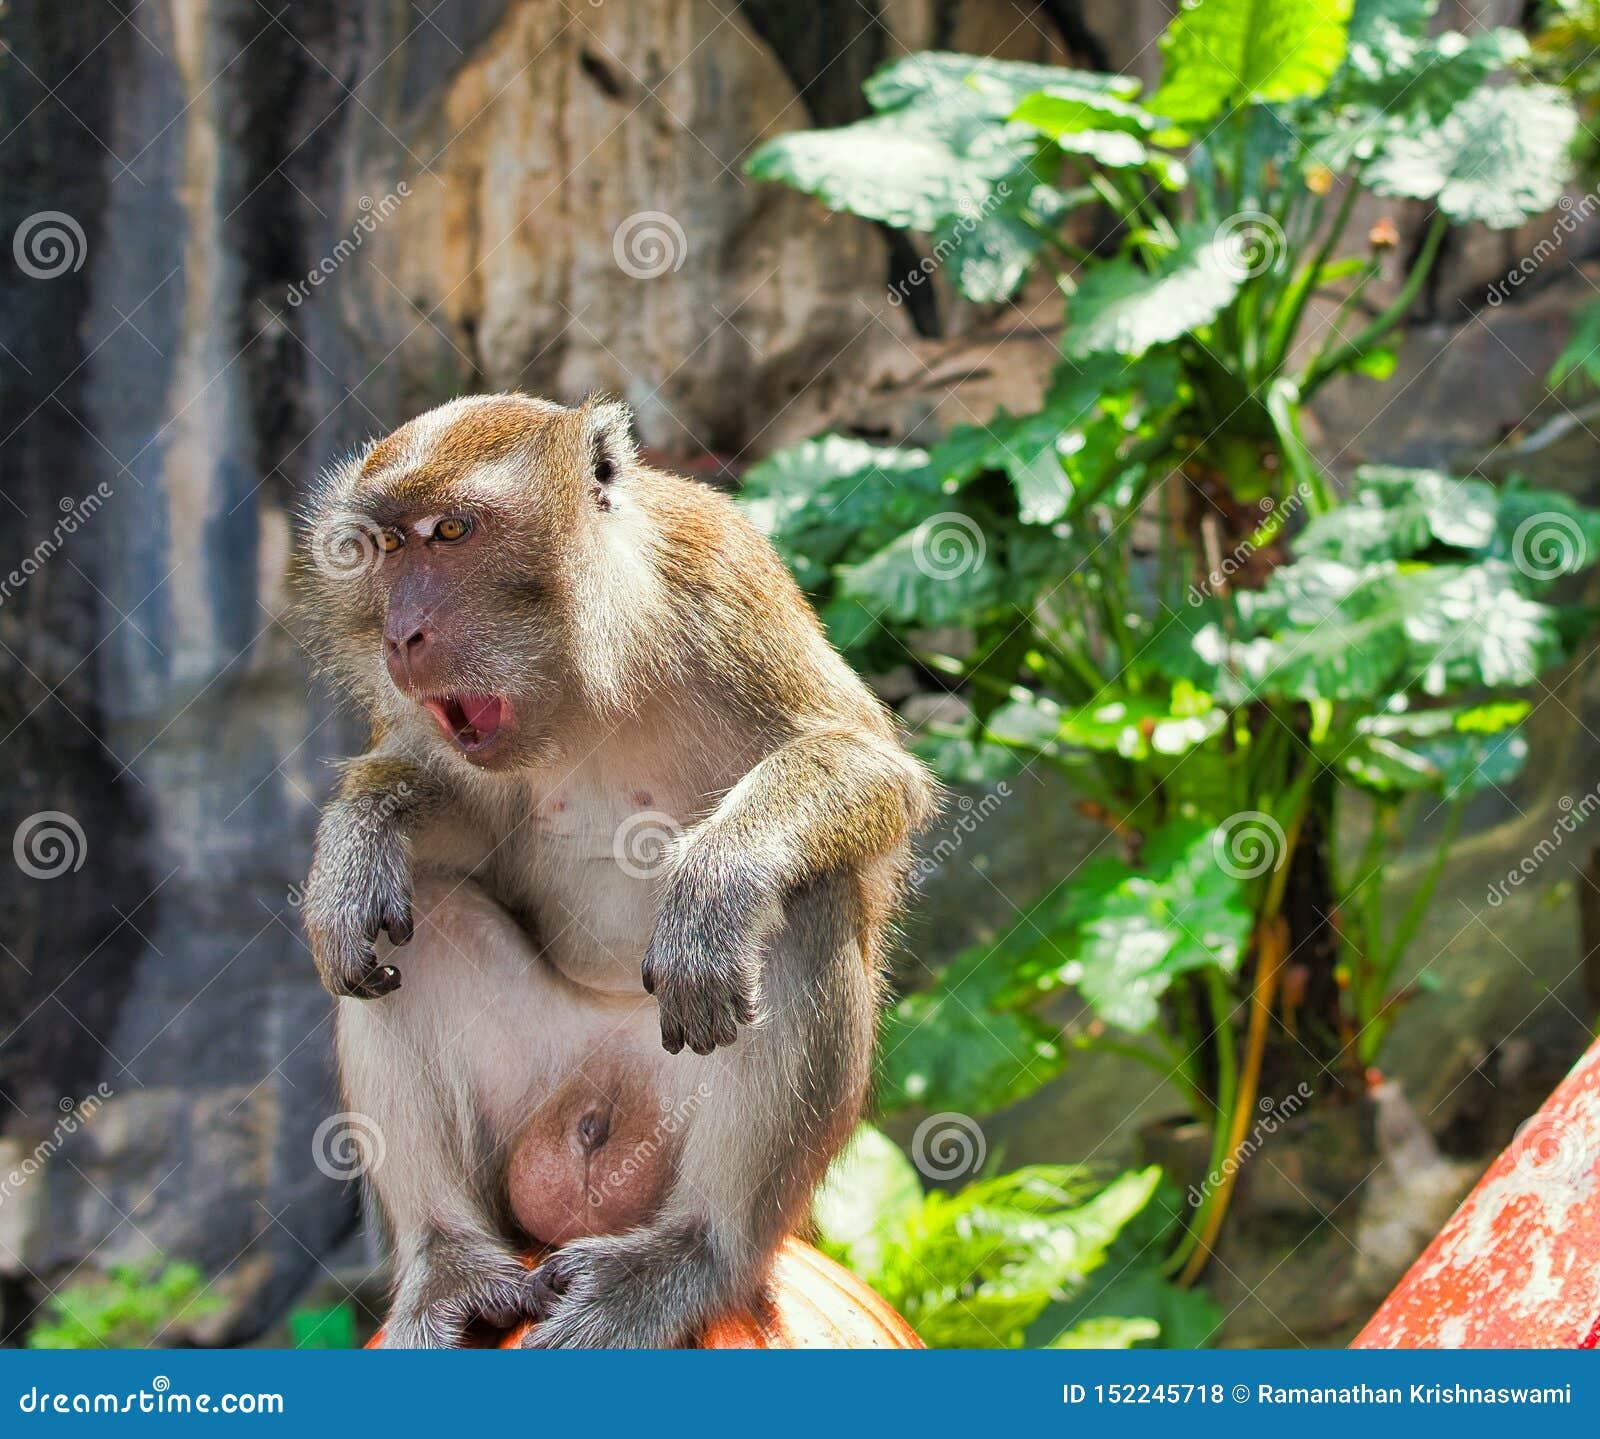 Monkey of batu caves